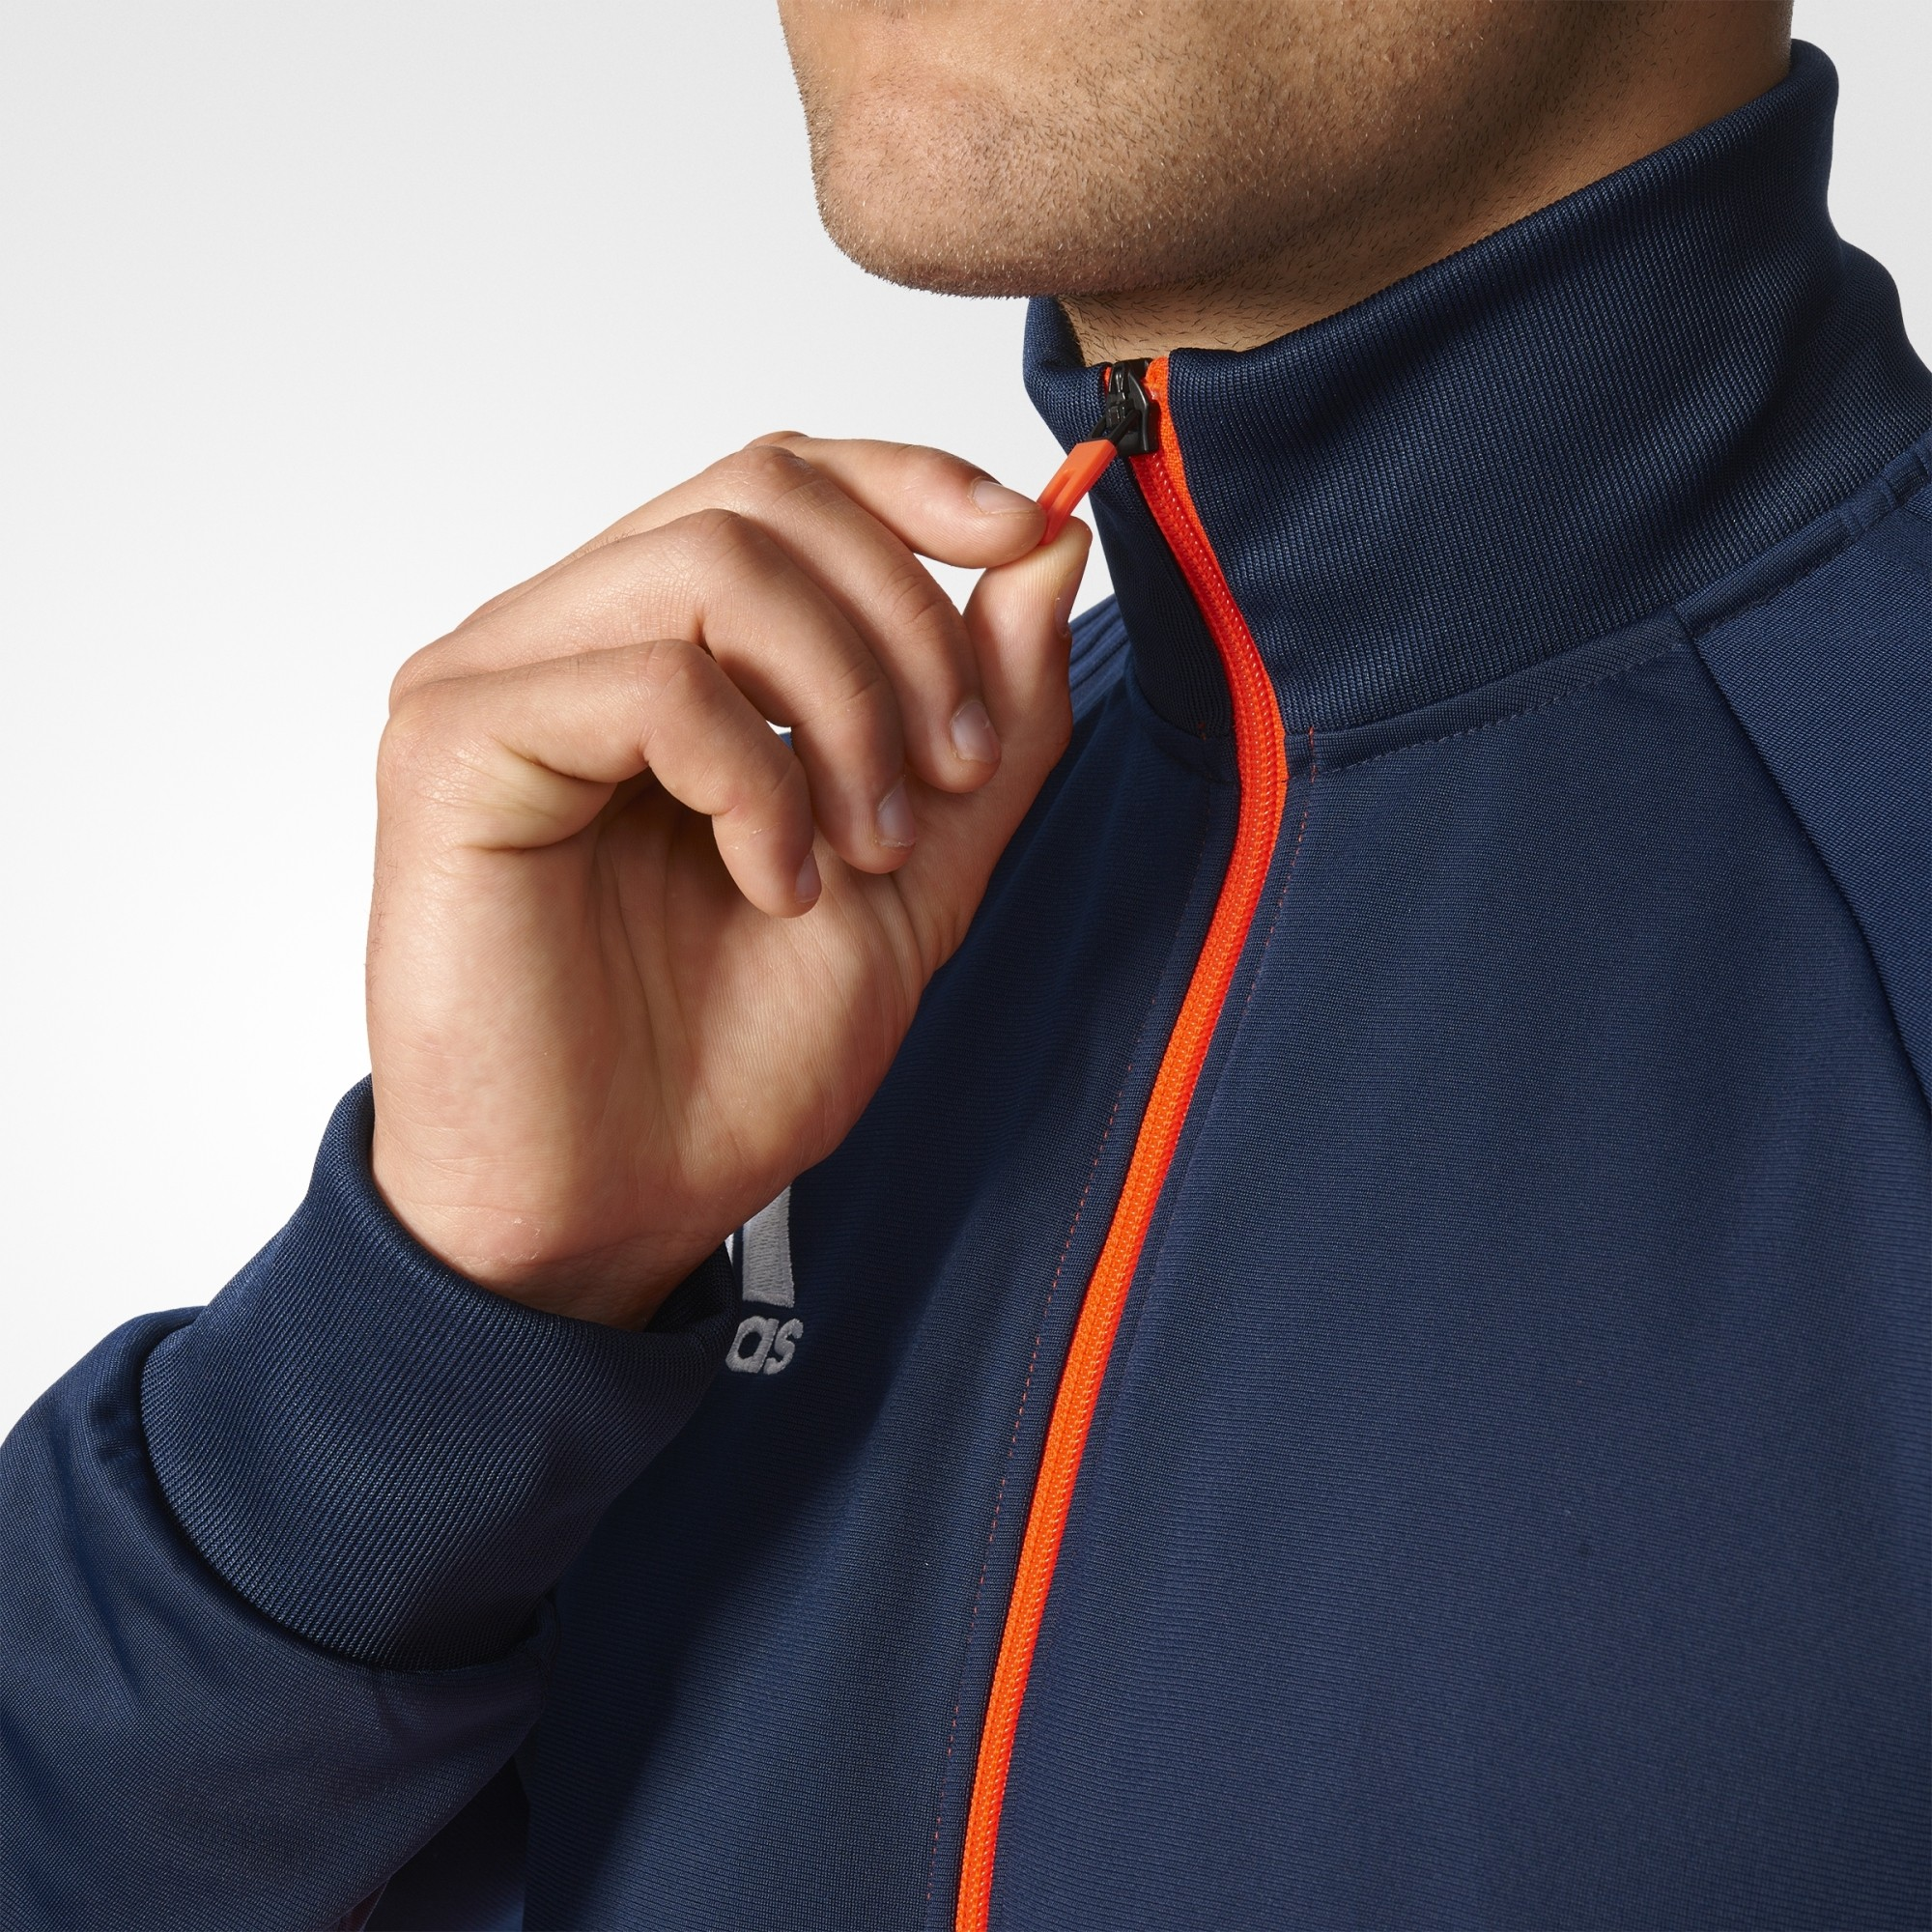 Adidas bluza tiro17 training granatowo pomarańczowa BQ2601